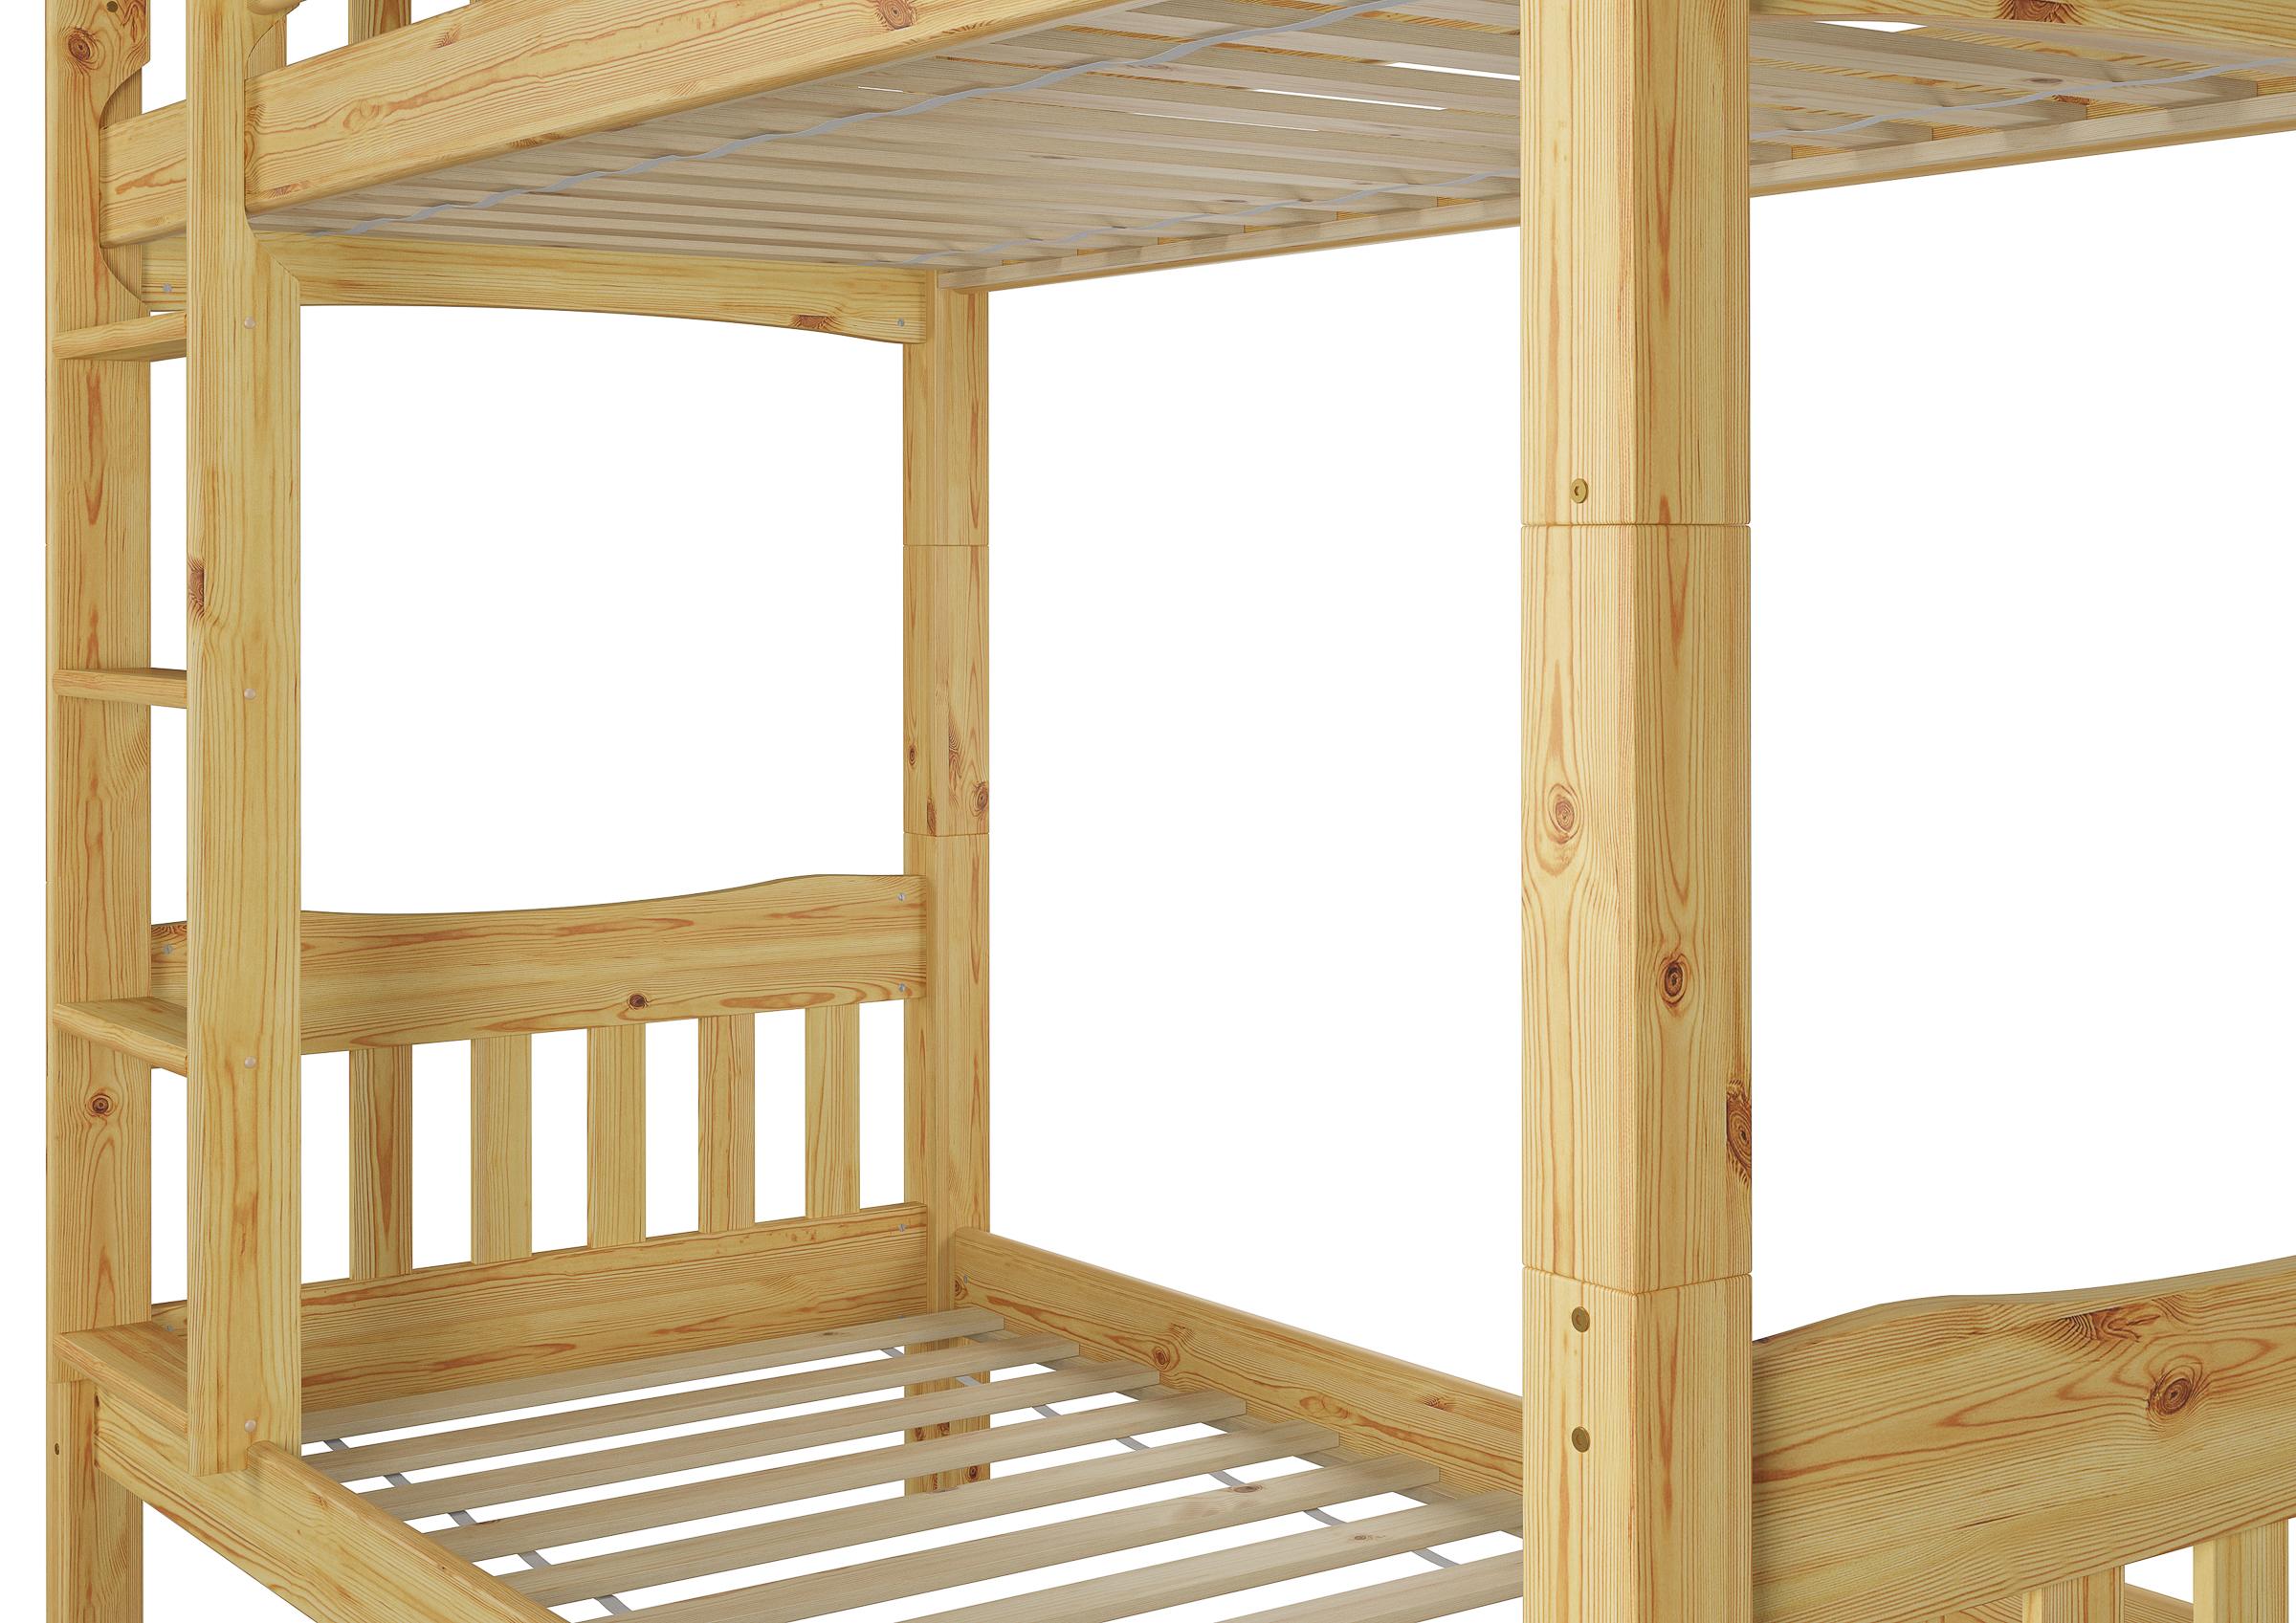 Etagenbett Kiefer Massiv : Ni s etagenbett kiefer massiv rollroste